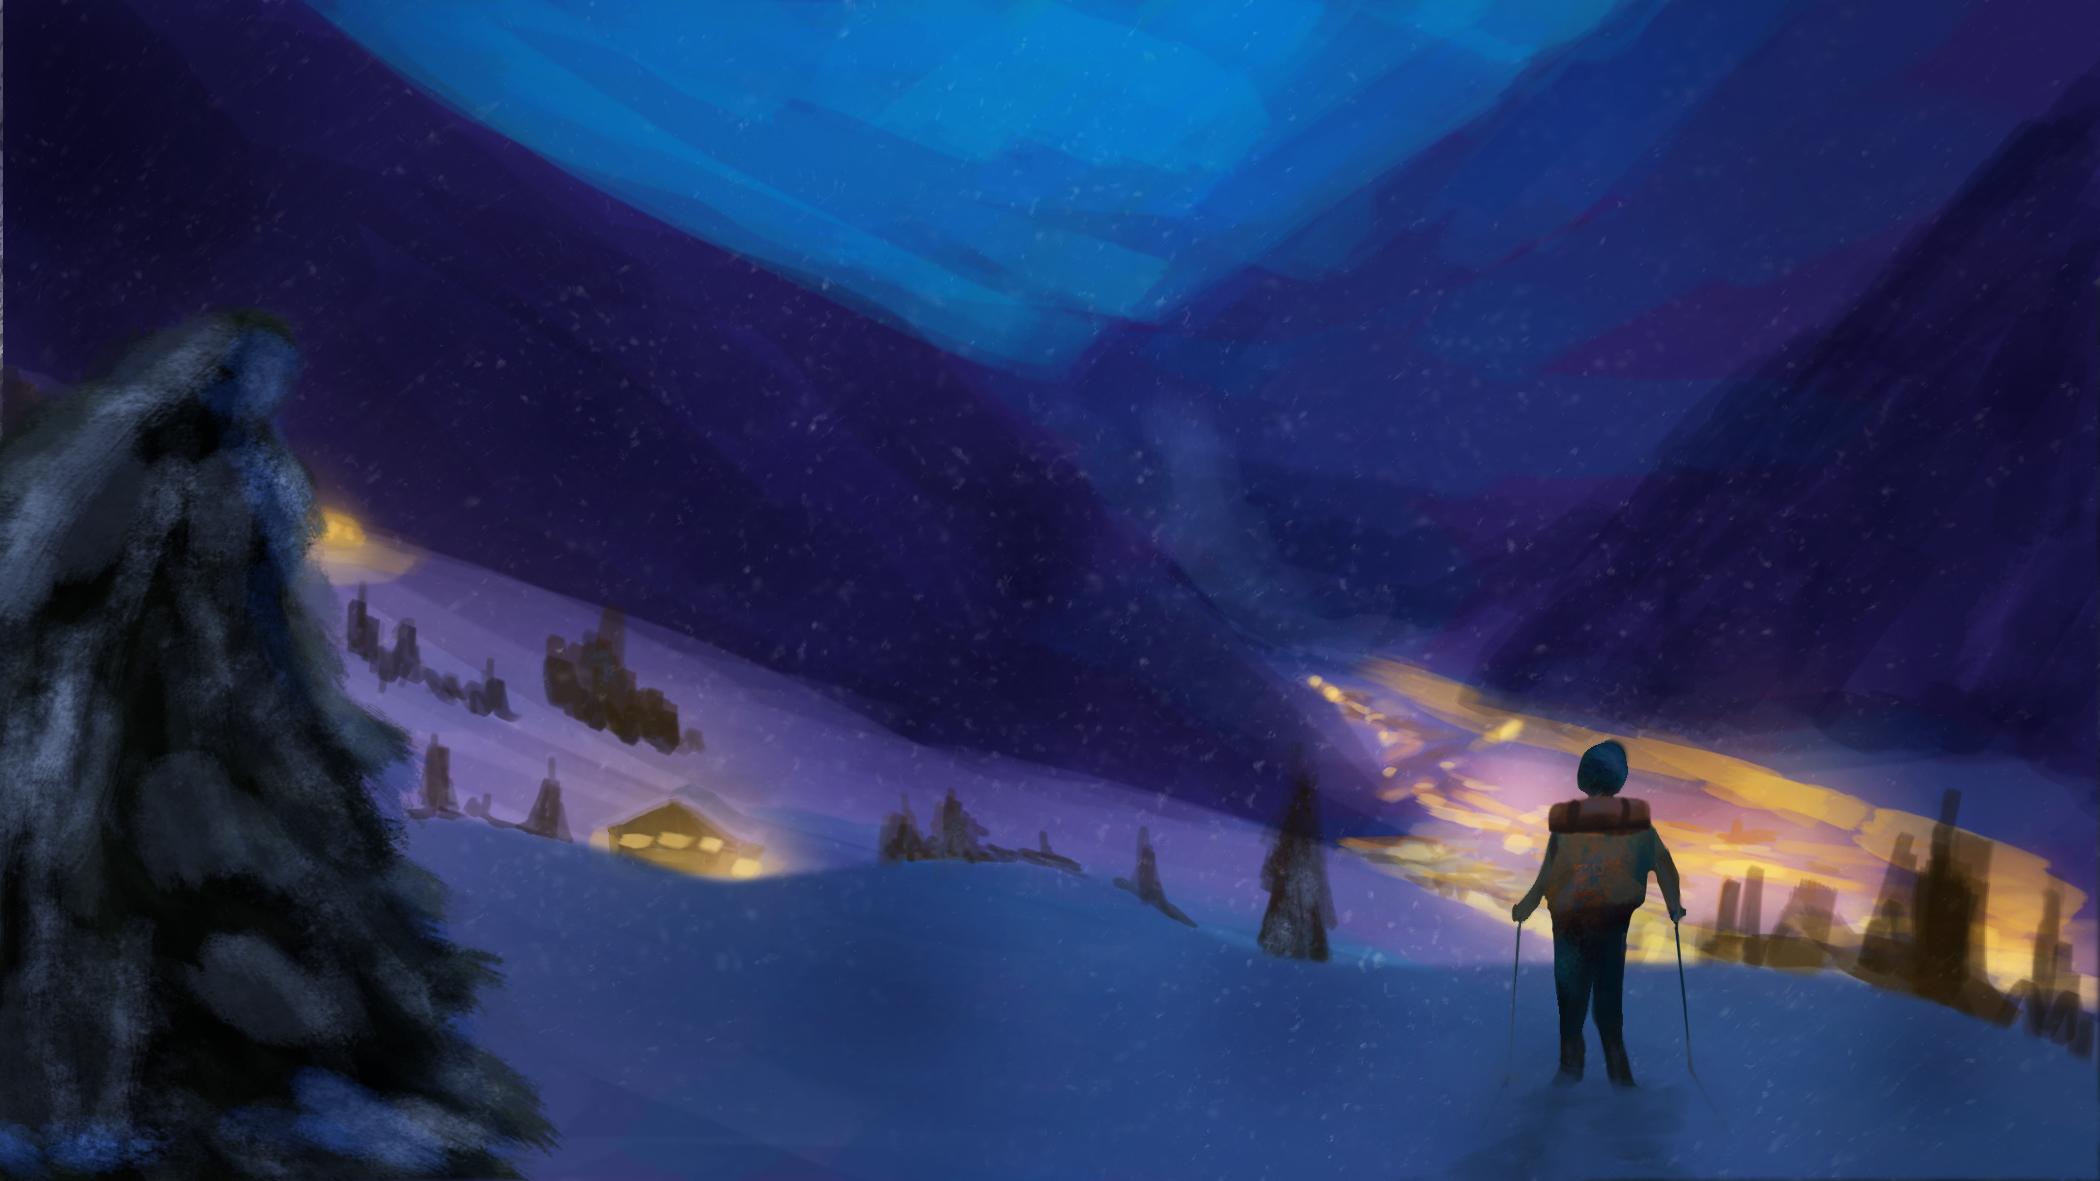 Snowy mountain village2.jpg